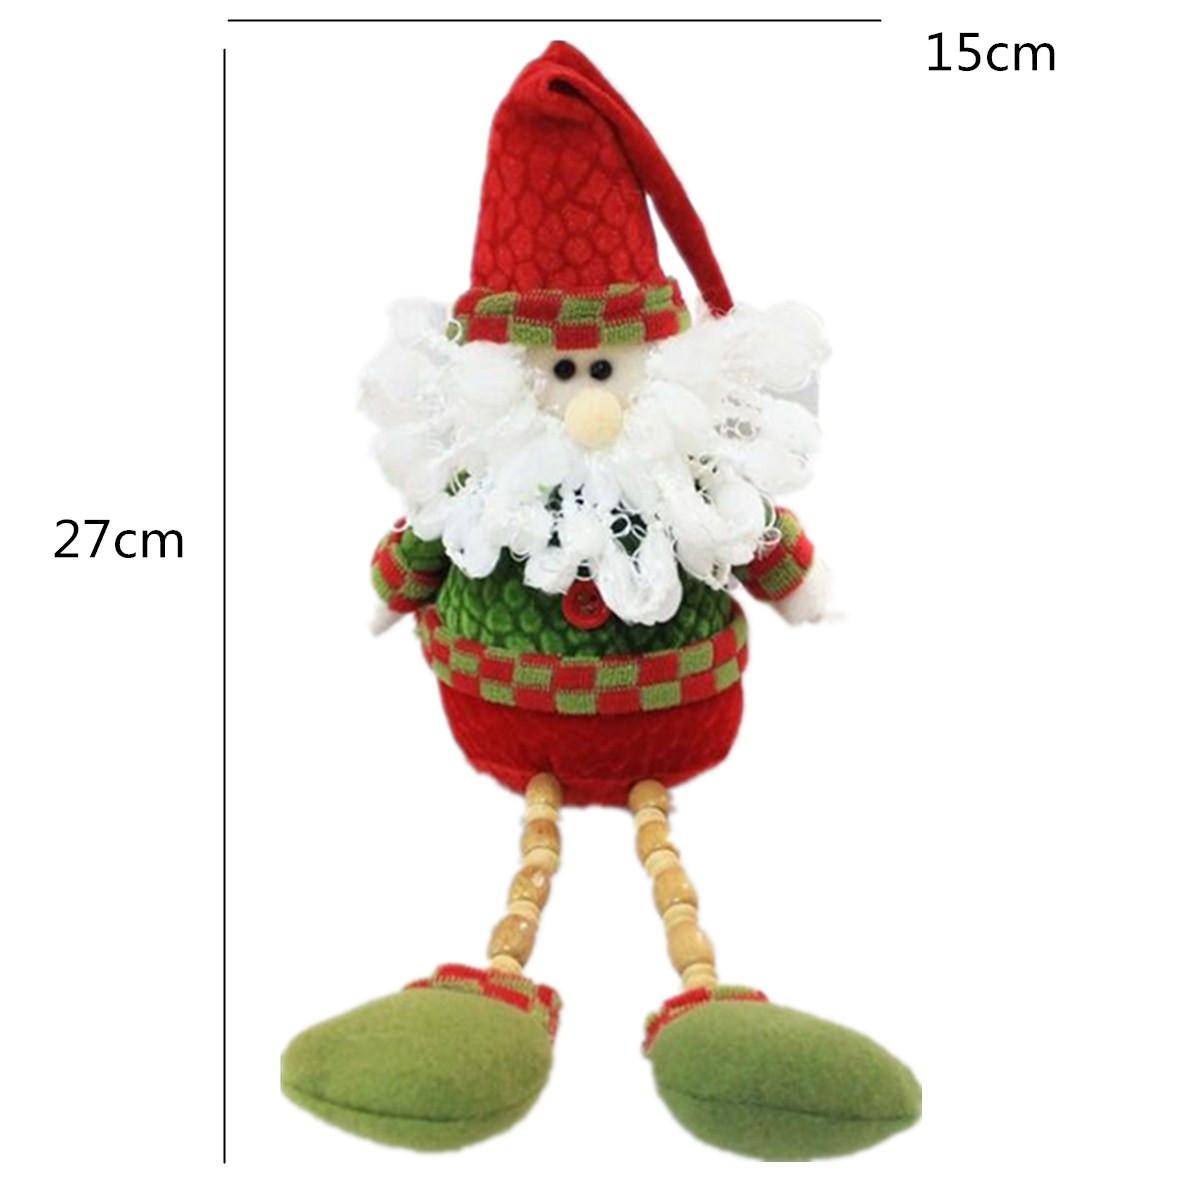 Santa Claus Snowman Reindeer 26x13cm Christmas Doll Home Decor Xmas Gift - Photo: 7